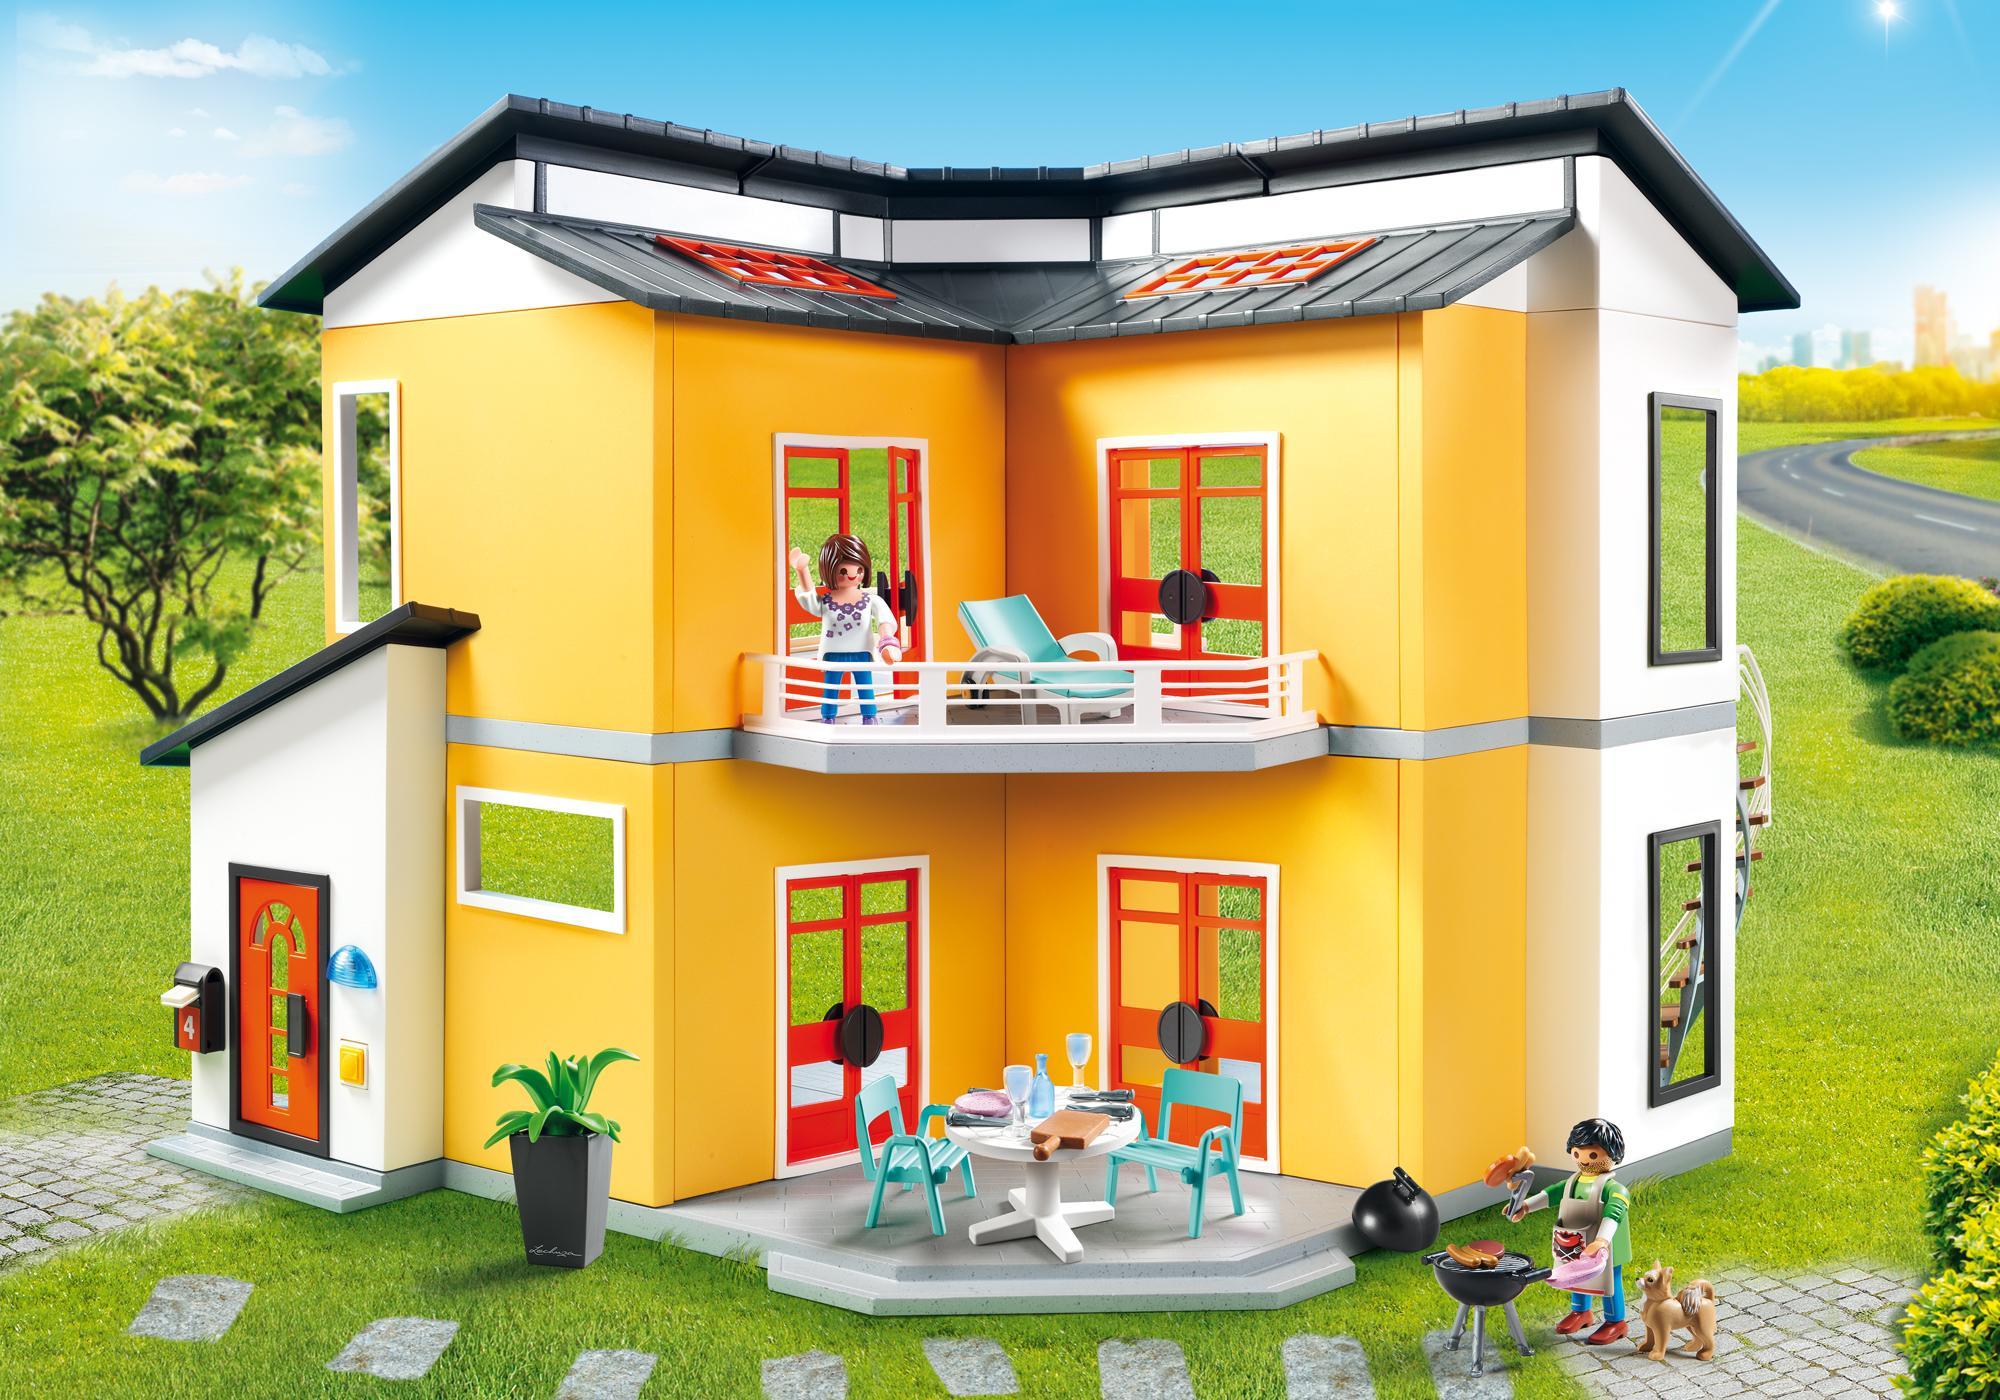 Extension Salle De Bain Maison Moderne Playmobil ~ Maison Moderne 9266  Playmobil Suisse